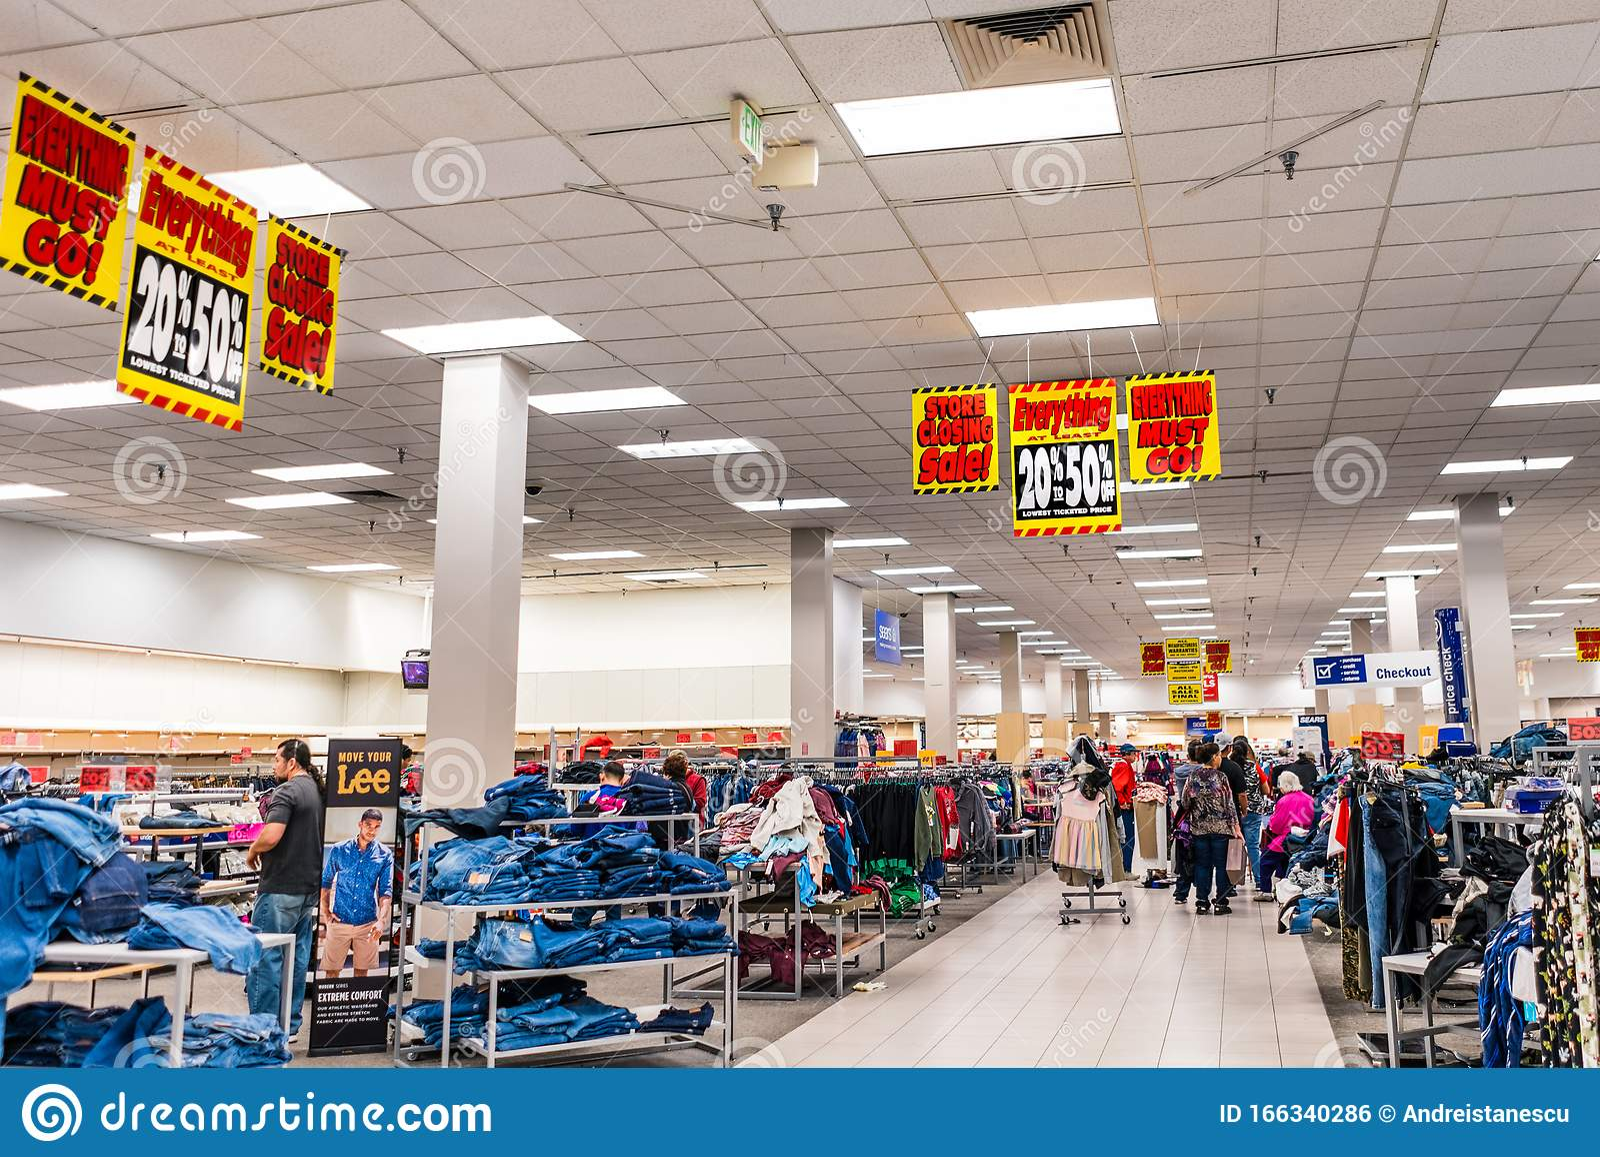 Dec 6 2019 San Jose / CA / USA - Sears Store Having Its ...